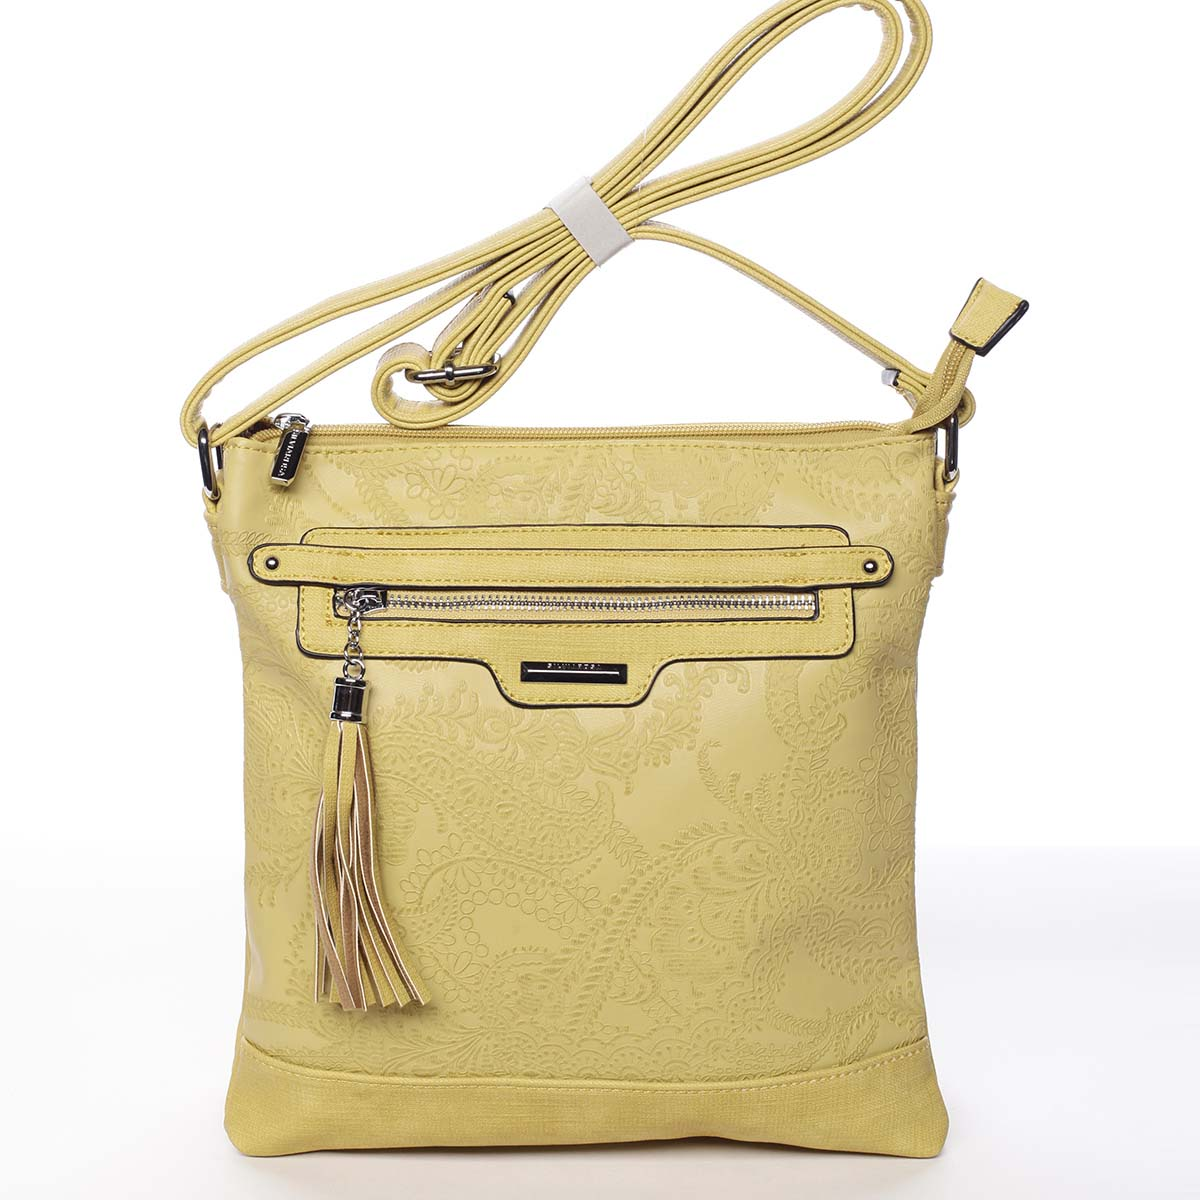 Módna dámska žltá crossbody kabelka so vzorom - Silvia Rosa Gillian